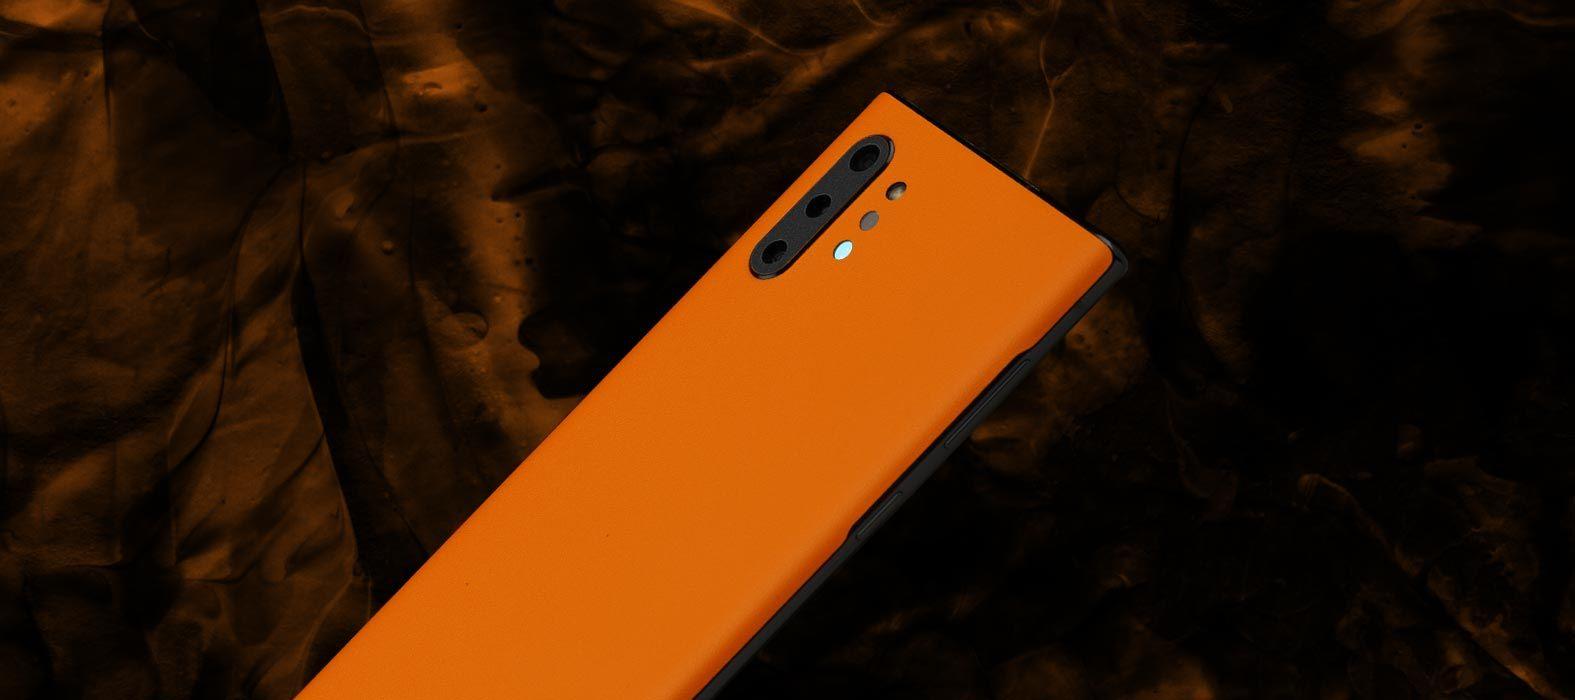 Galaxy Note 10 Plus Sanstone orange skins